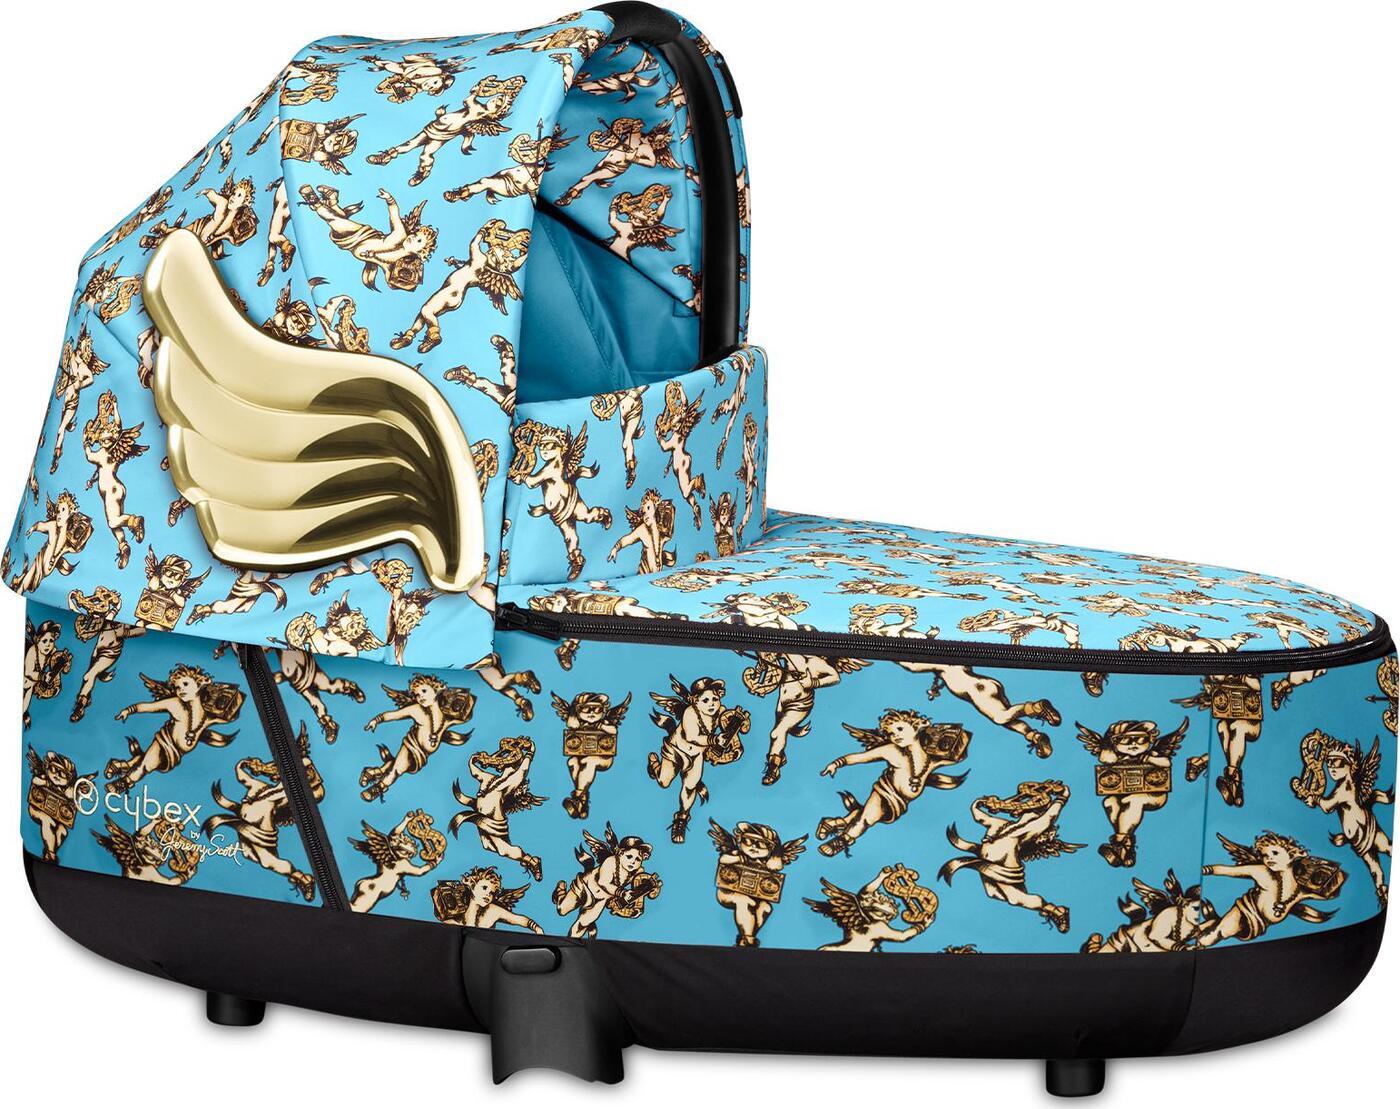 Cybex спальный блок для коляски Priam III (Cherubs Blue by Jeremy Scott) cybex конверт для коляски priam cherubs pink by jeremy scott